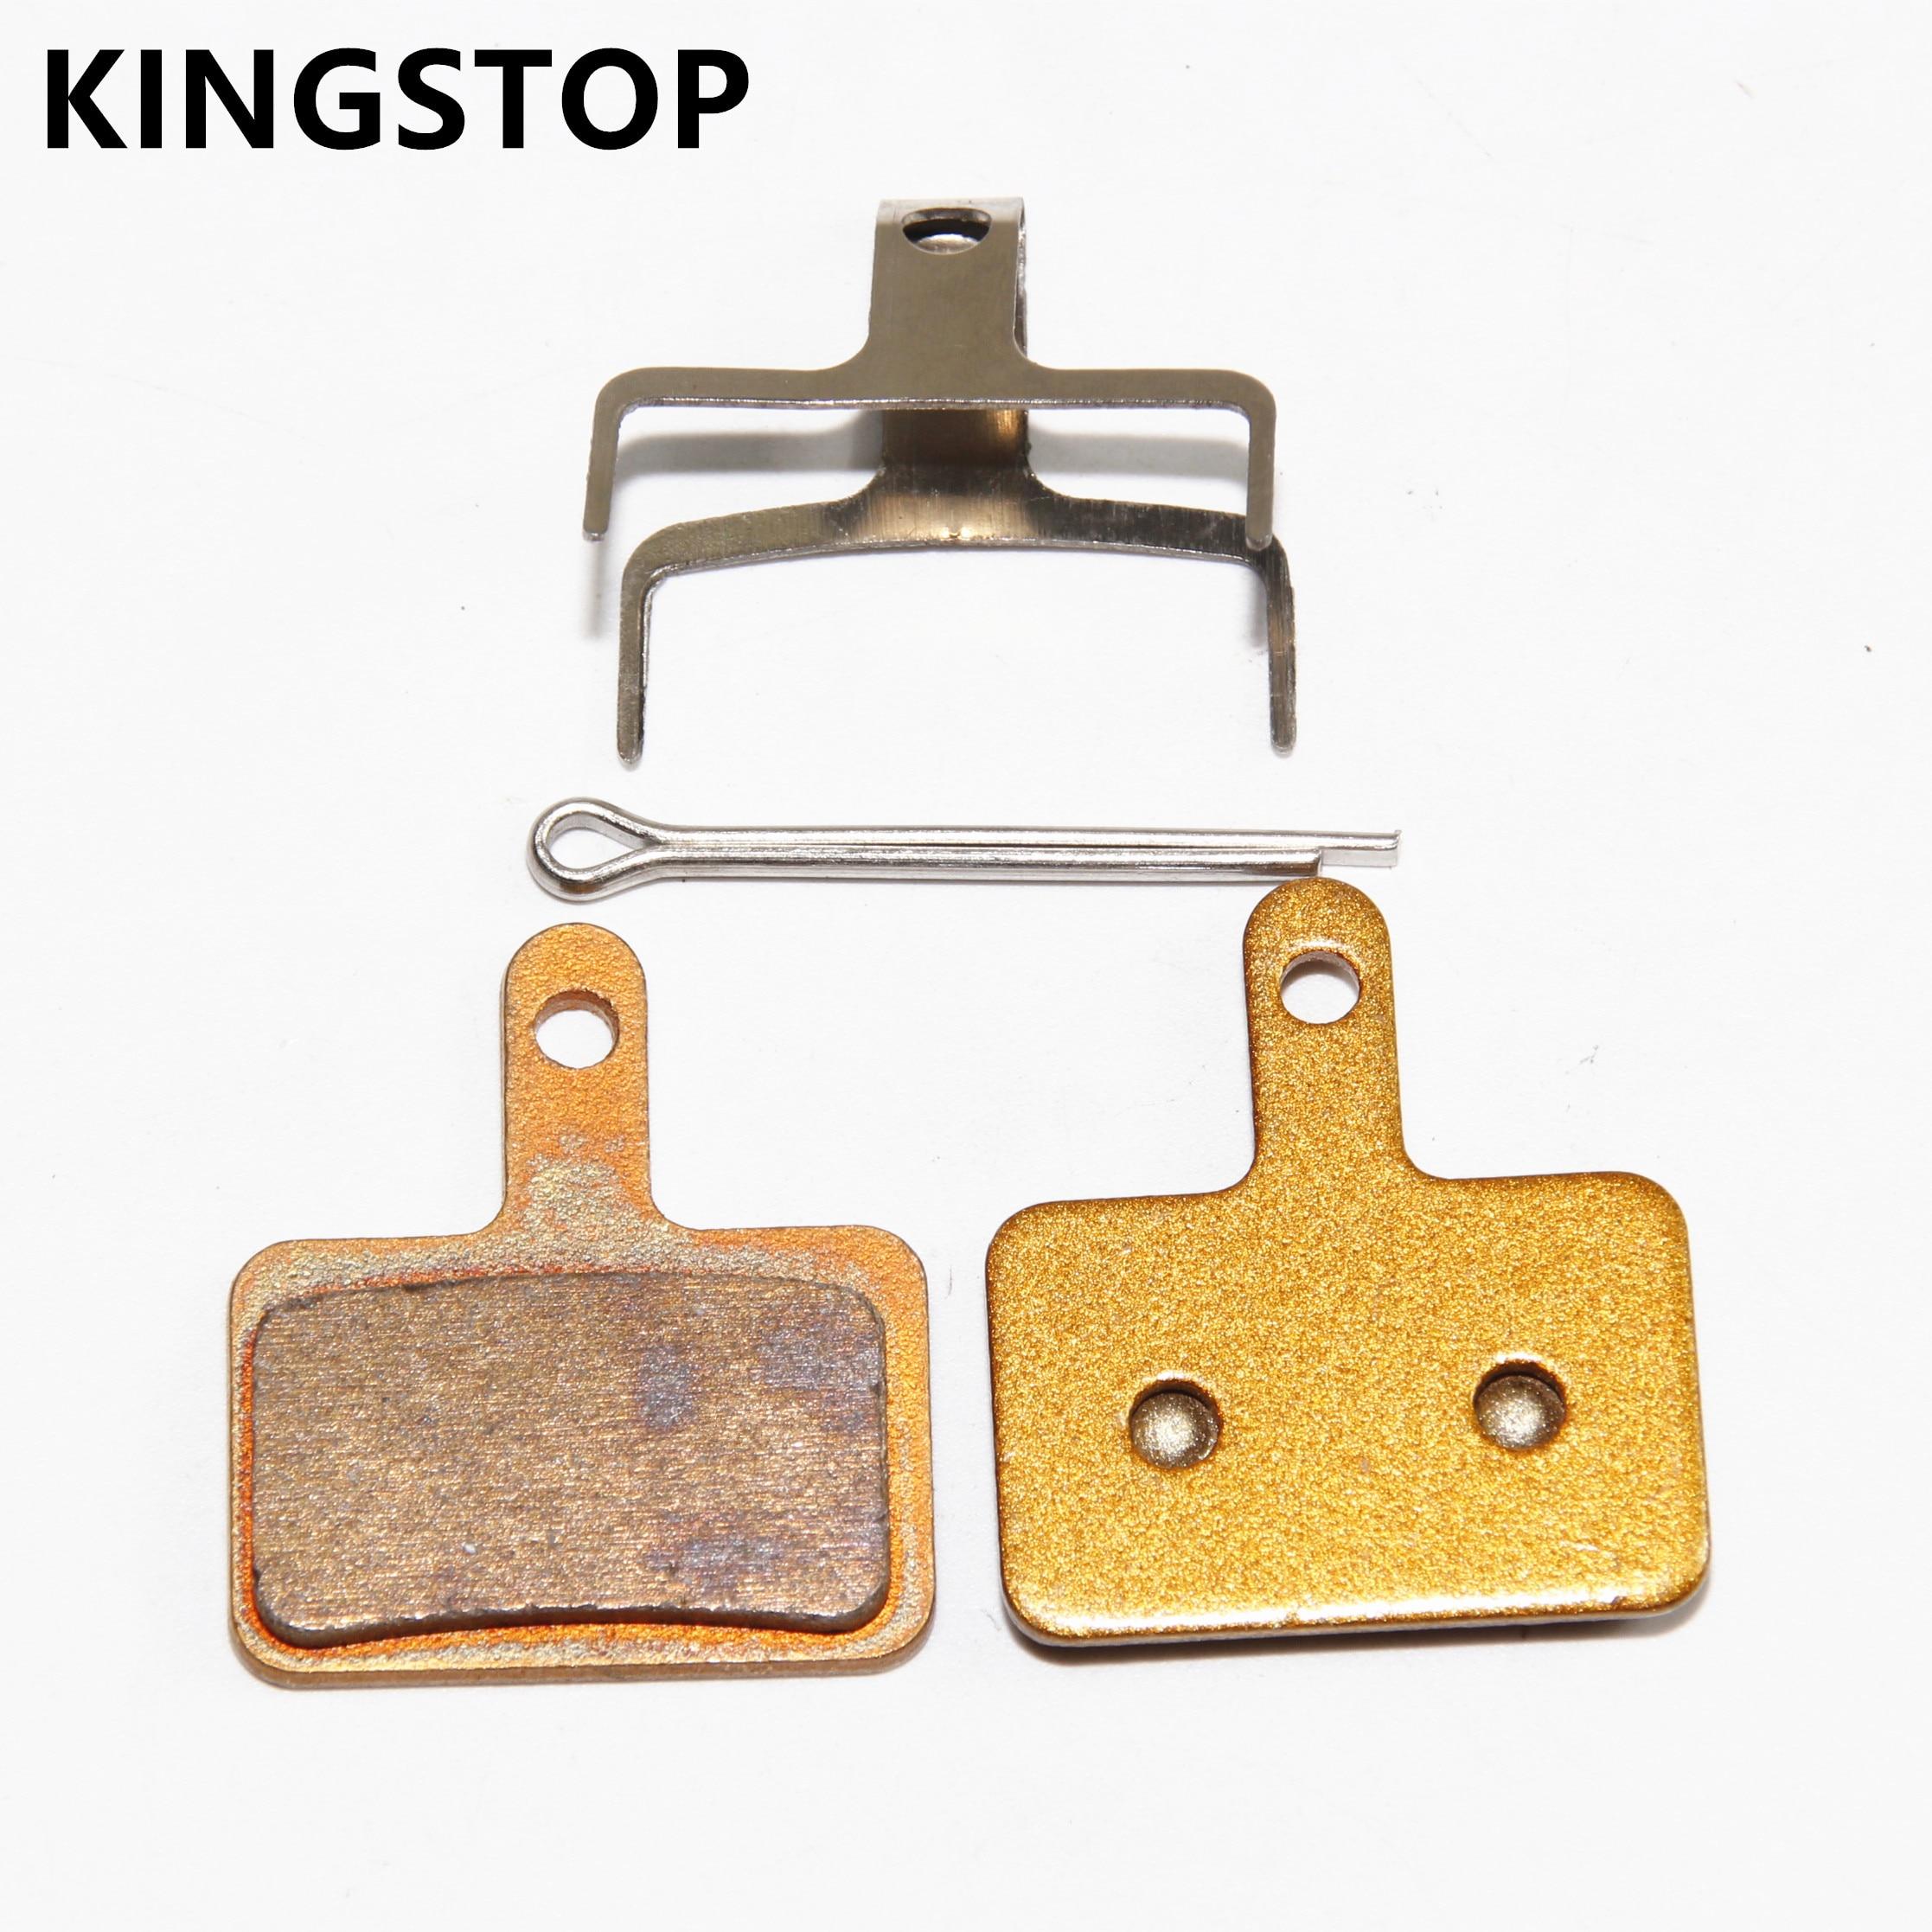 Kingstop 811S bicycle sintered brake pads for Shimano Deore BRM 525 Nexave C500/600 M486 M485 M475 M416 M446 M375